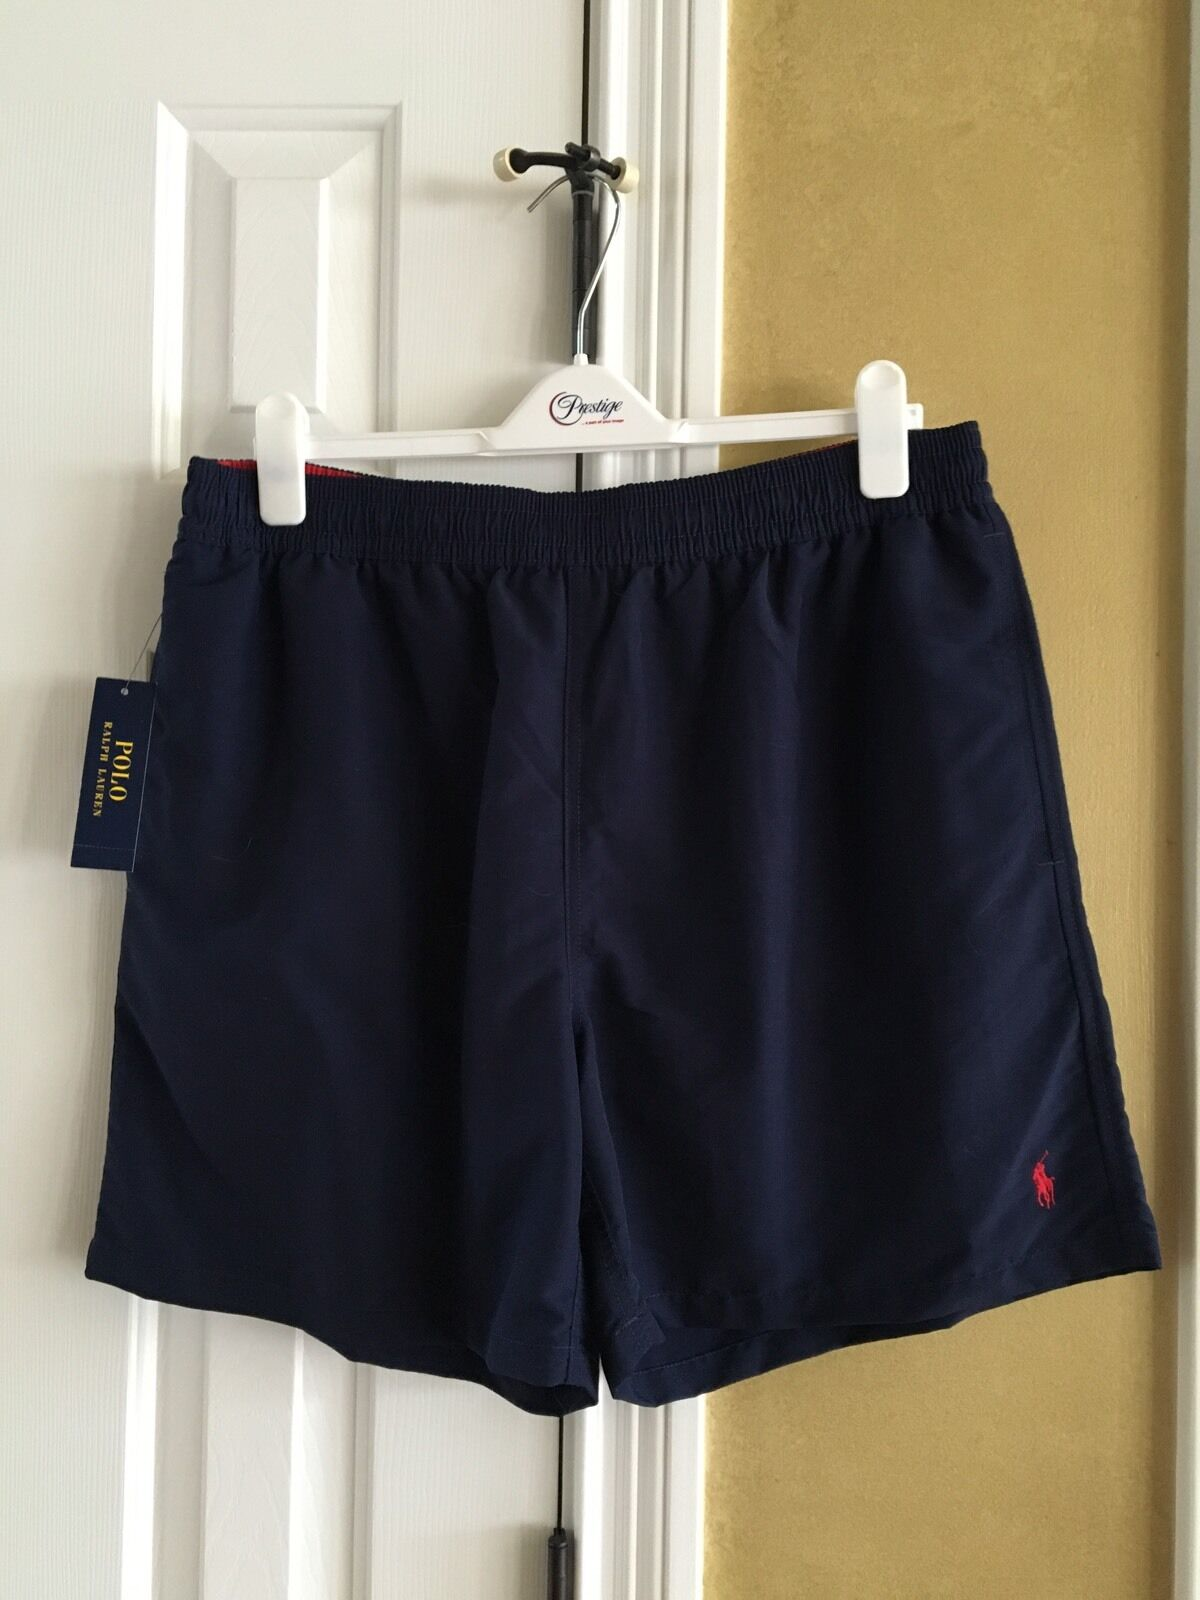 NWT Polo Ralph Lauren Swim Navy bluee Trunks Swimming Shorts XXL